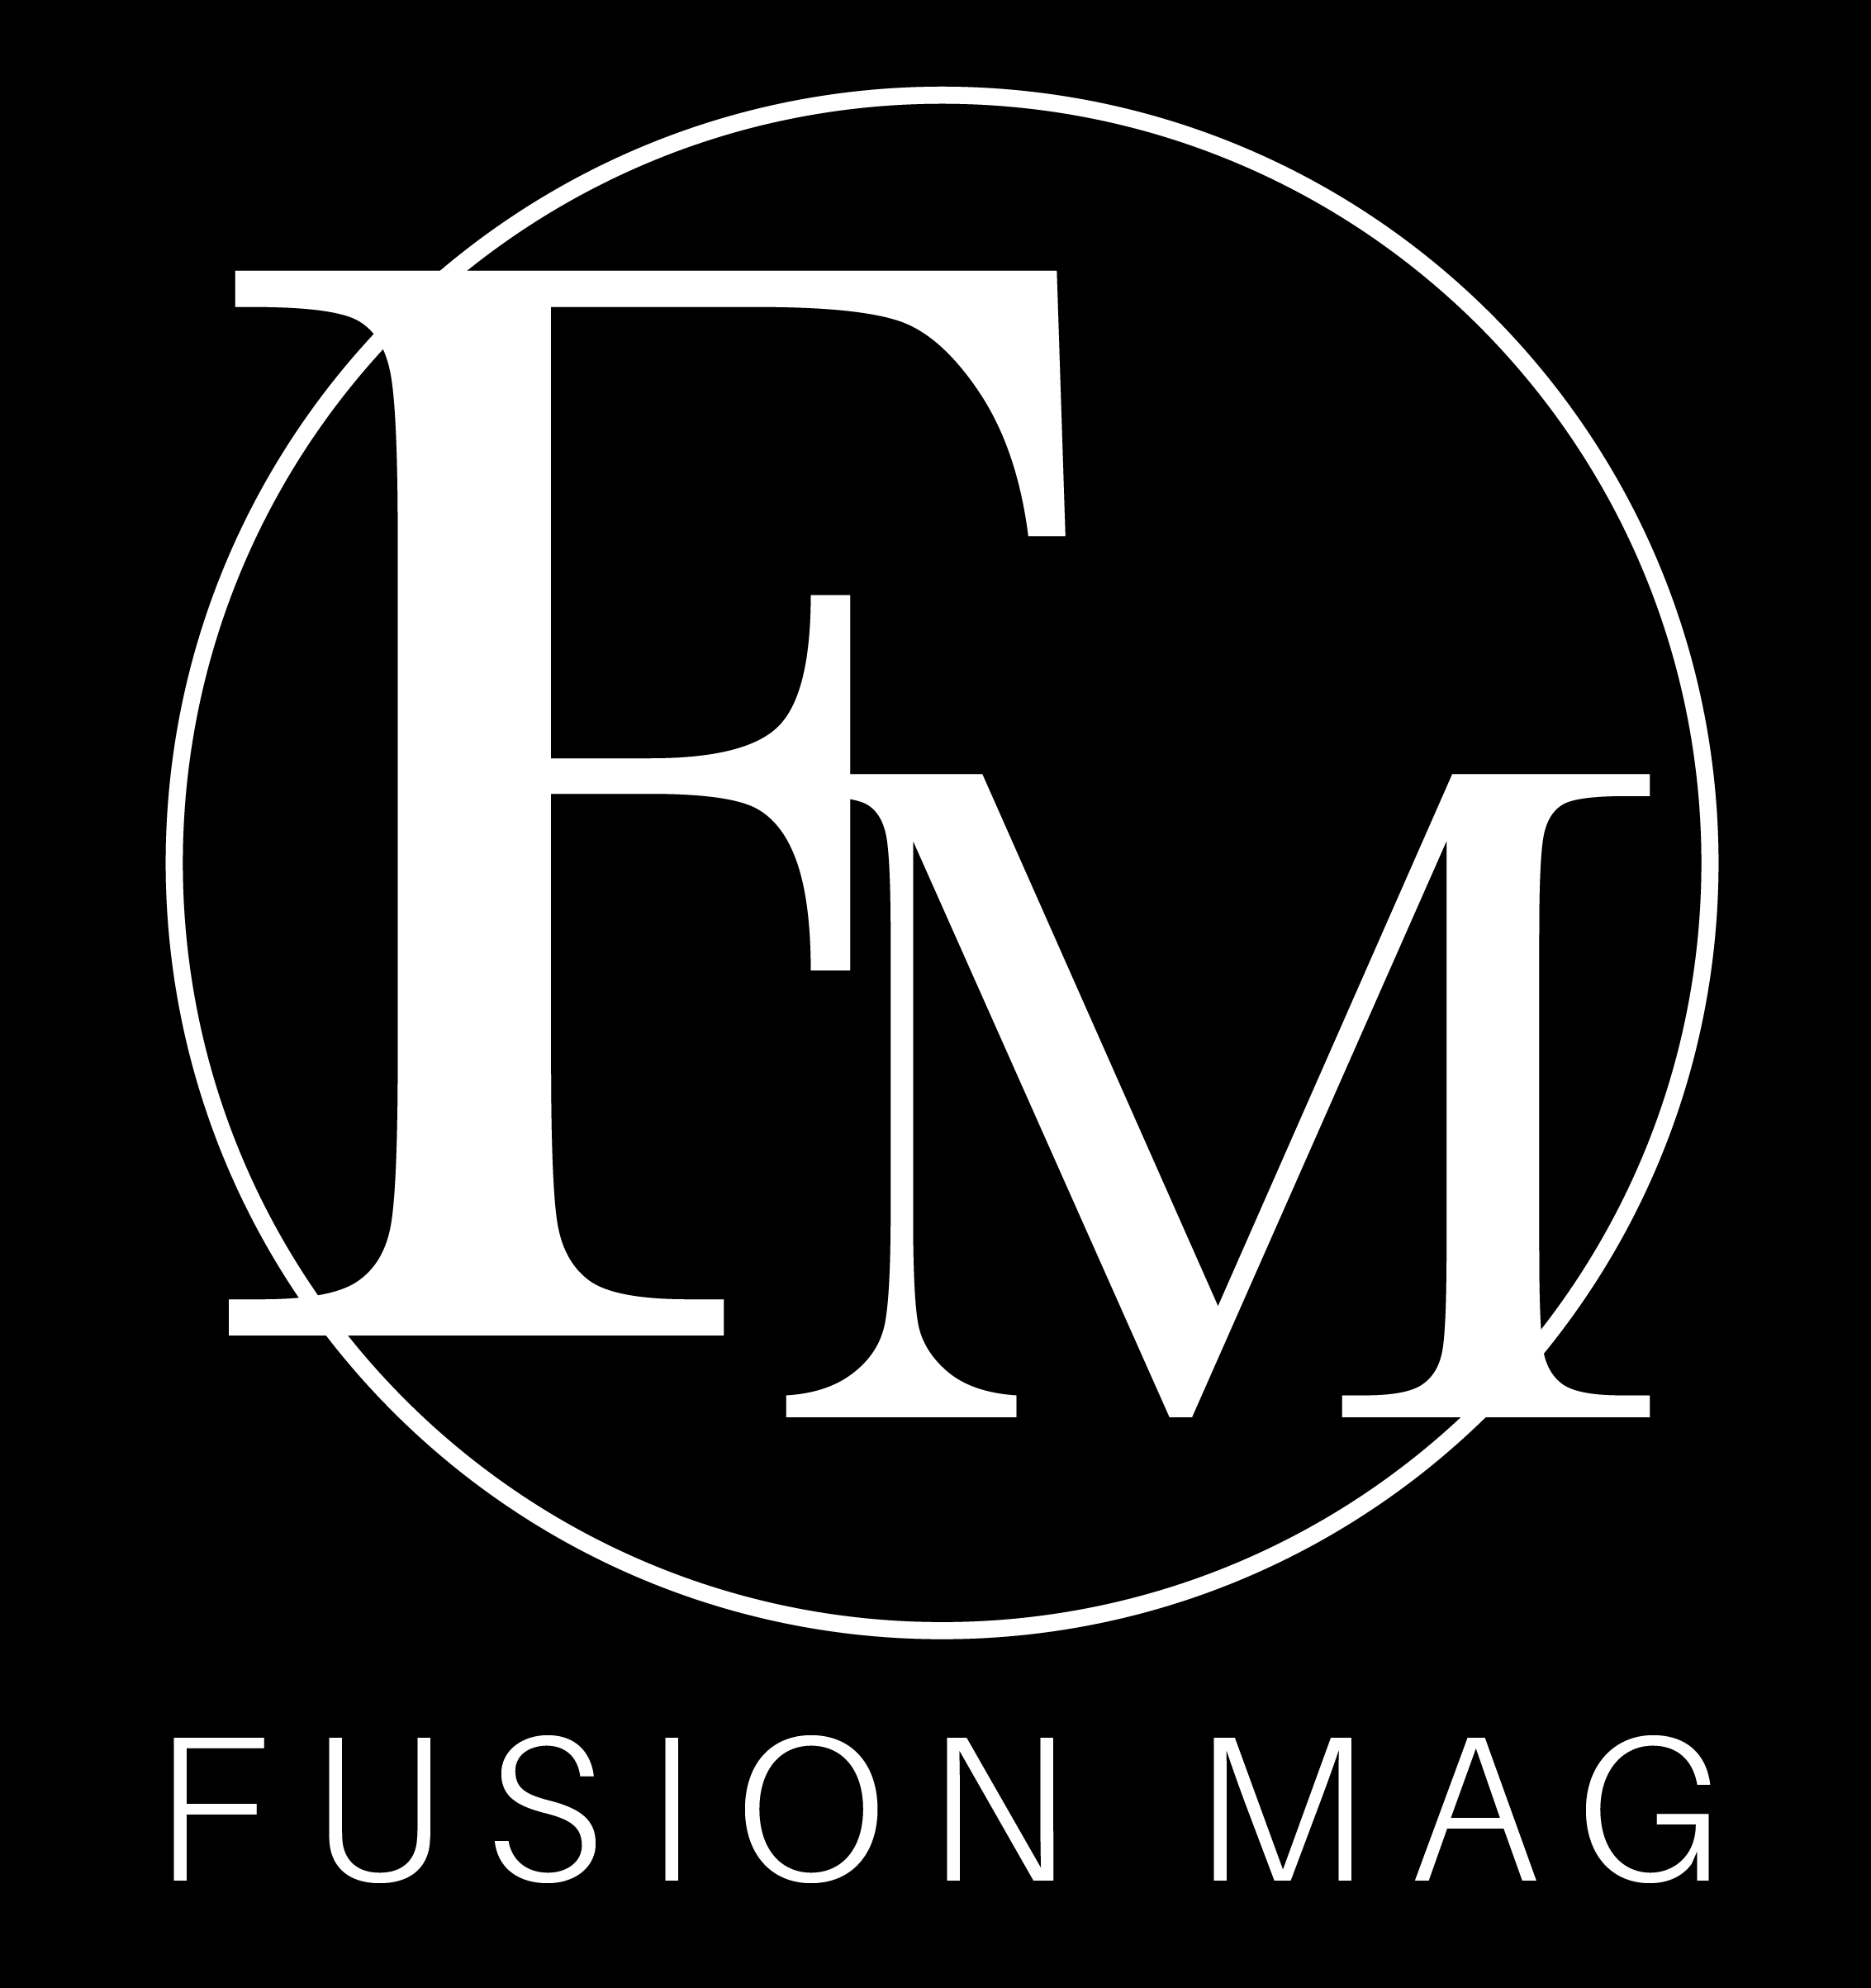 https://jbdondolo.org/wp-content/uploads/2021/02/Fusion-Magazine.png